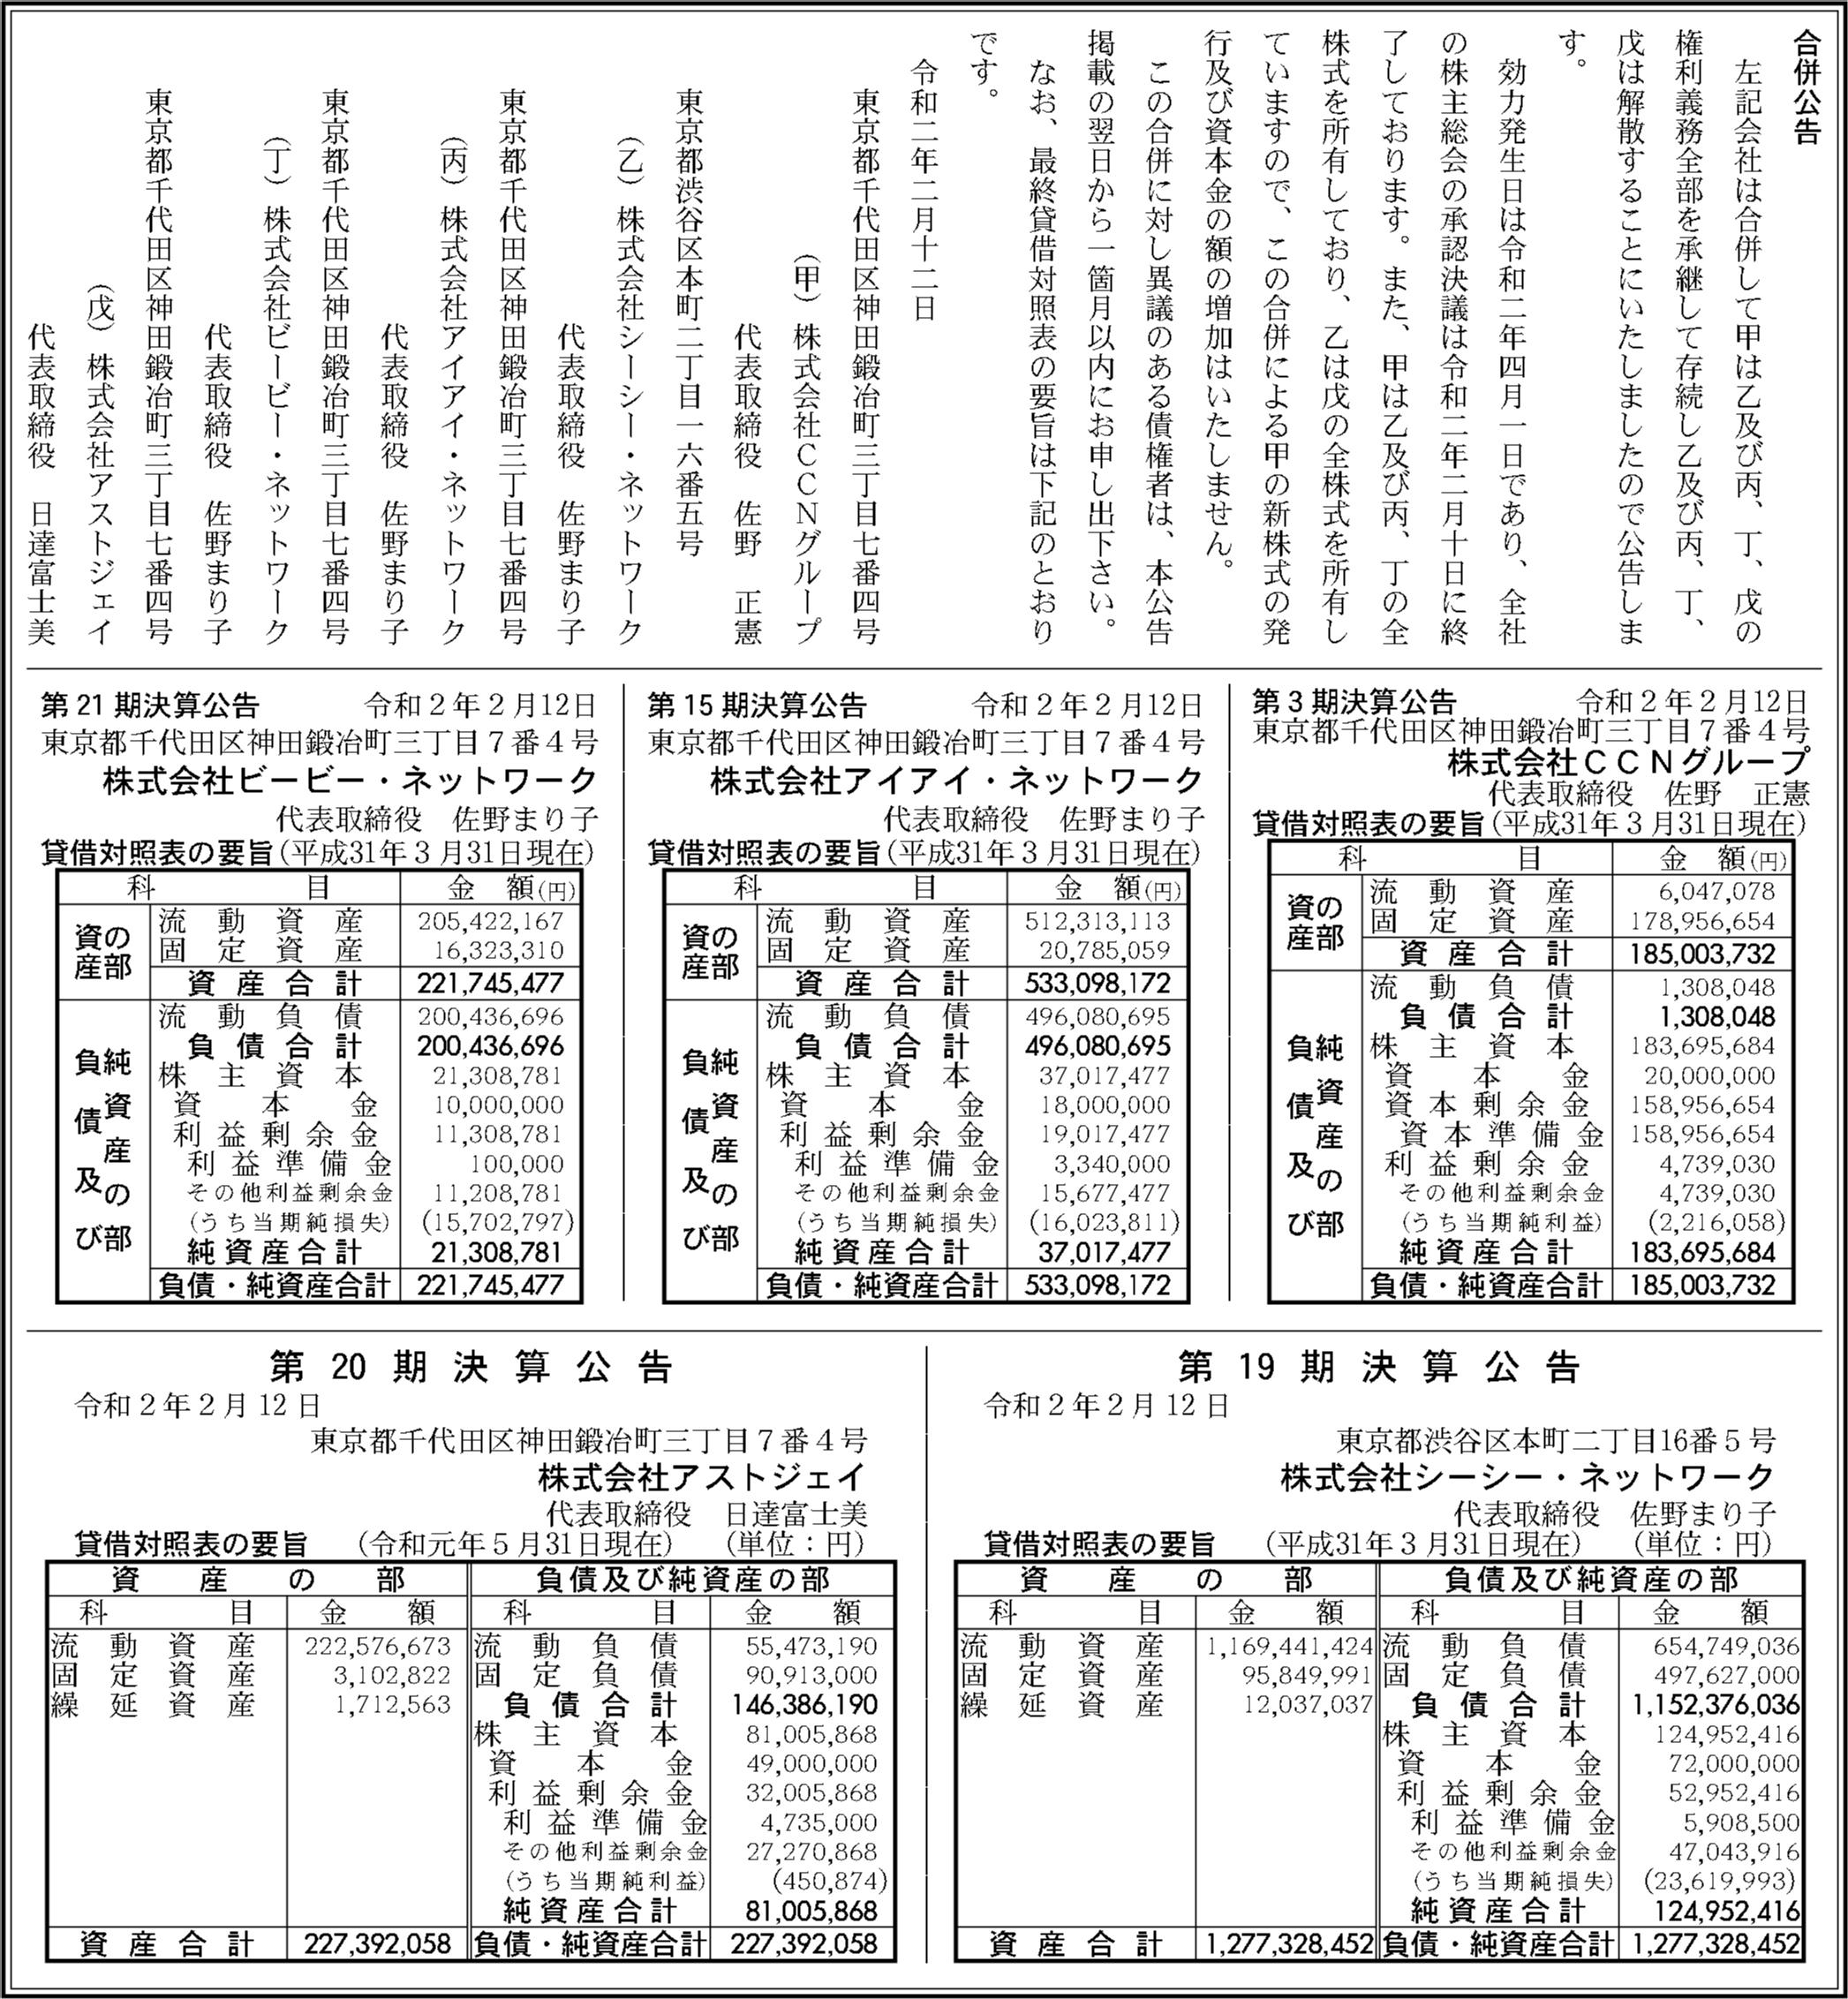 0064 0bf2b67f2241c782564cc2de4cdf88413f934aa6cc2efd97f1813a0869f90b2179cbae3b055ebaae0c7b8bf18a10f32af4f88b91bd25e3eb38a94be368fcdd5e 02